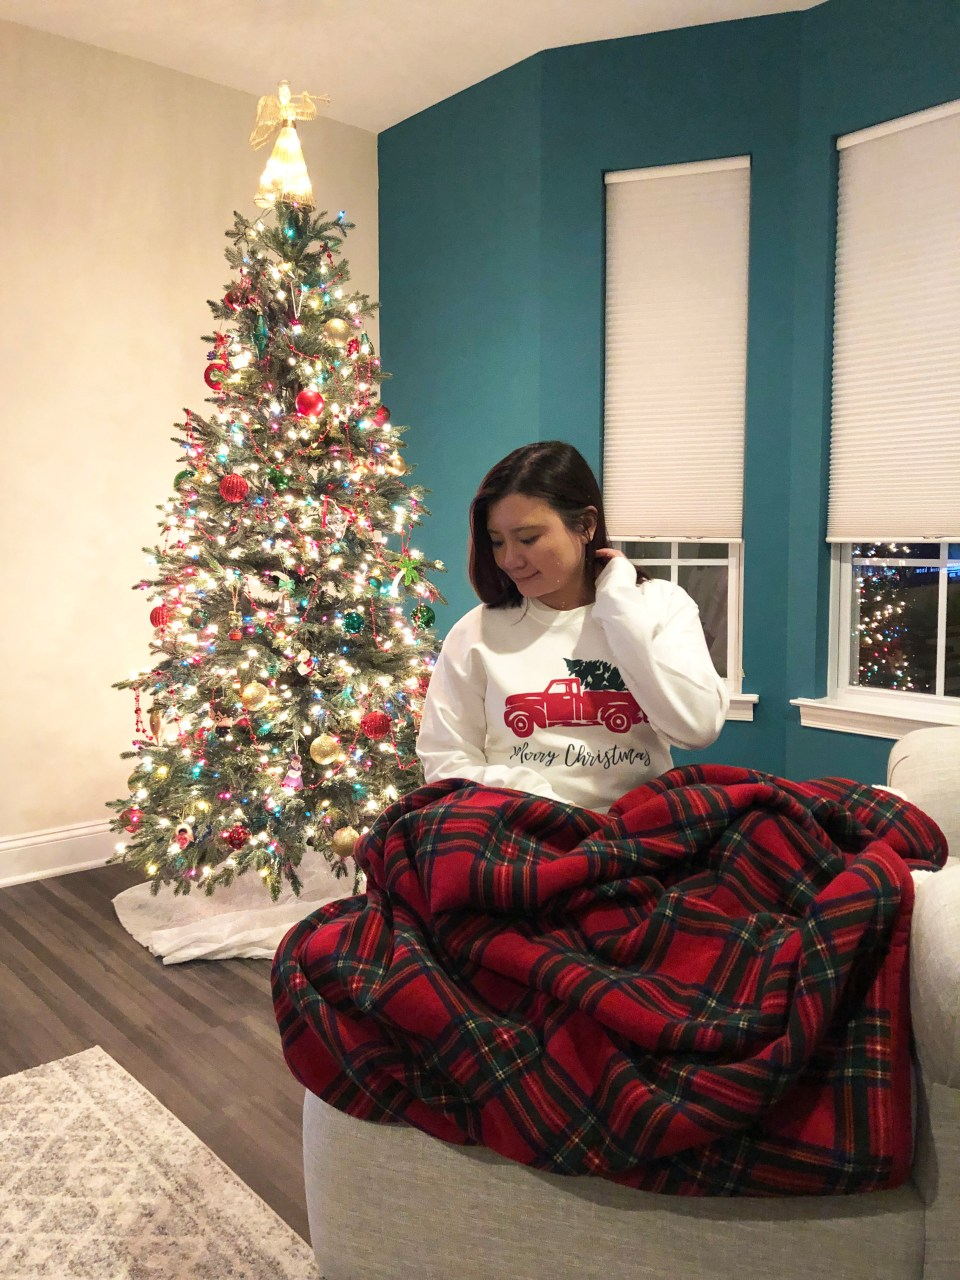 Christmas Tree Truck Sweatshirt + Plaid Sherpa Blanket